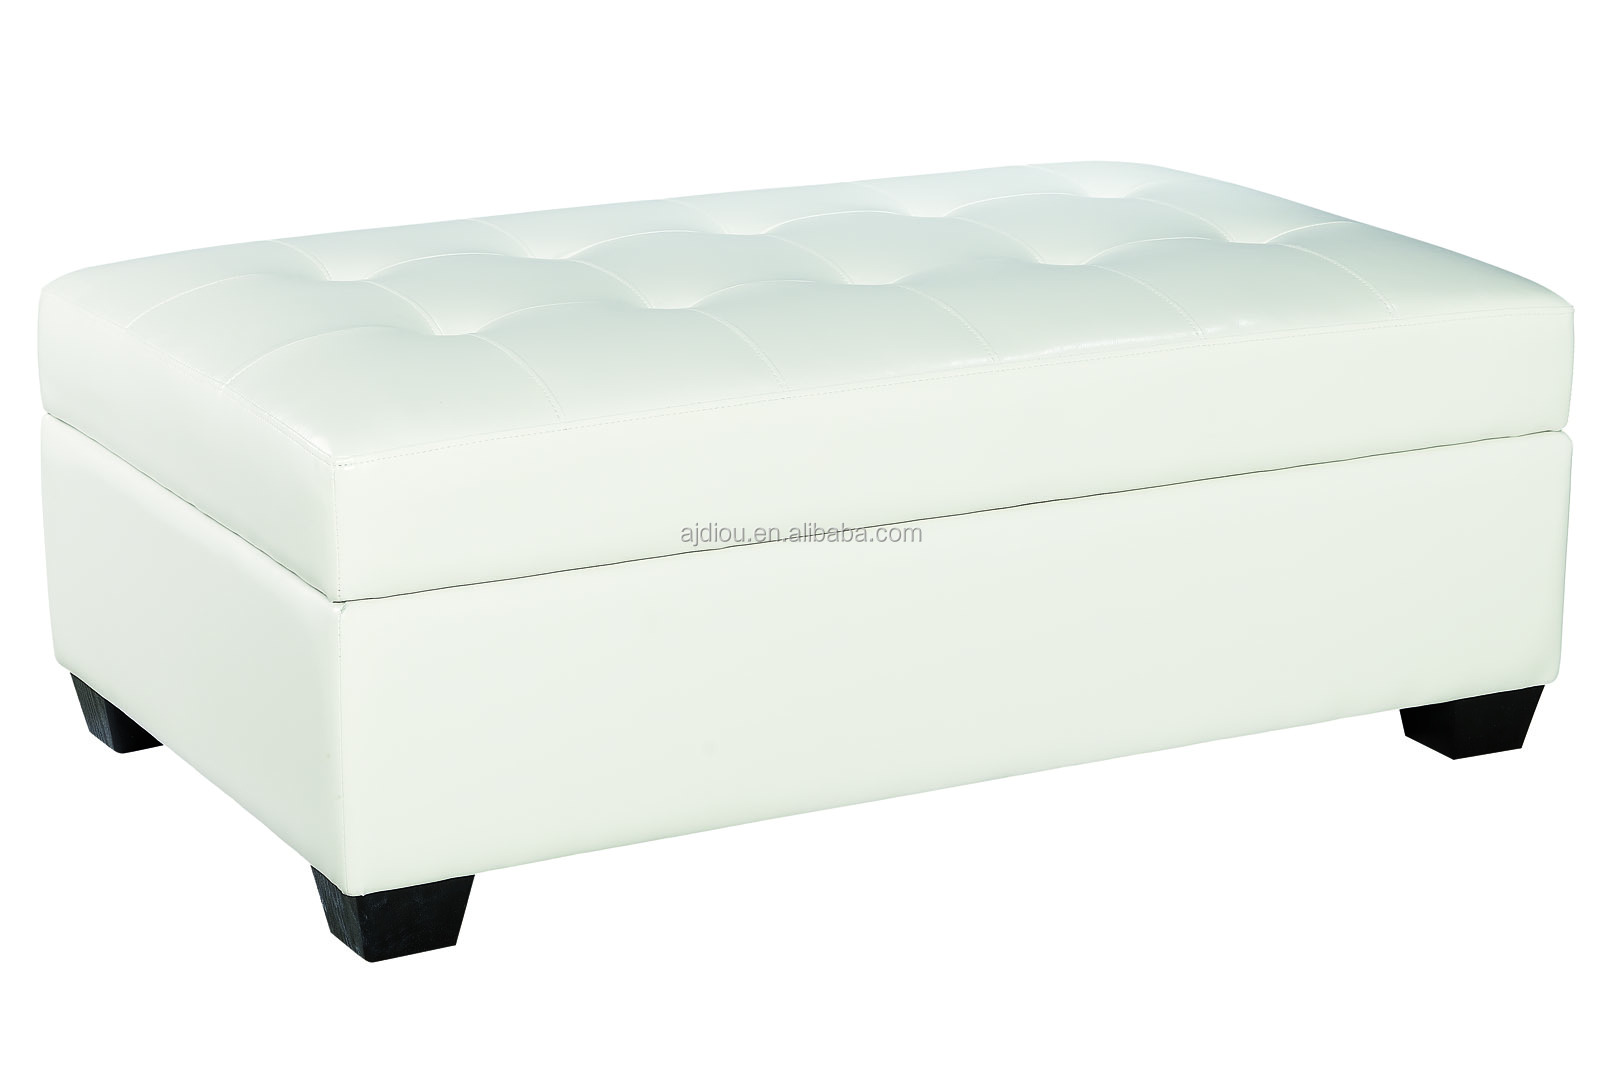 Fantástico Almacenamiento De Ikea Muebles Otomana Ornamento ...